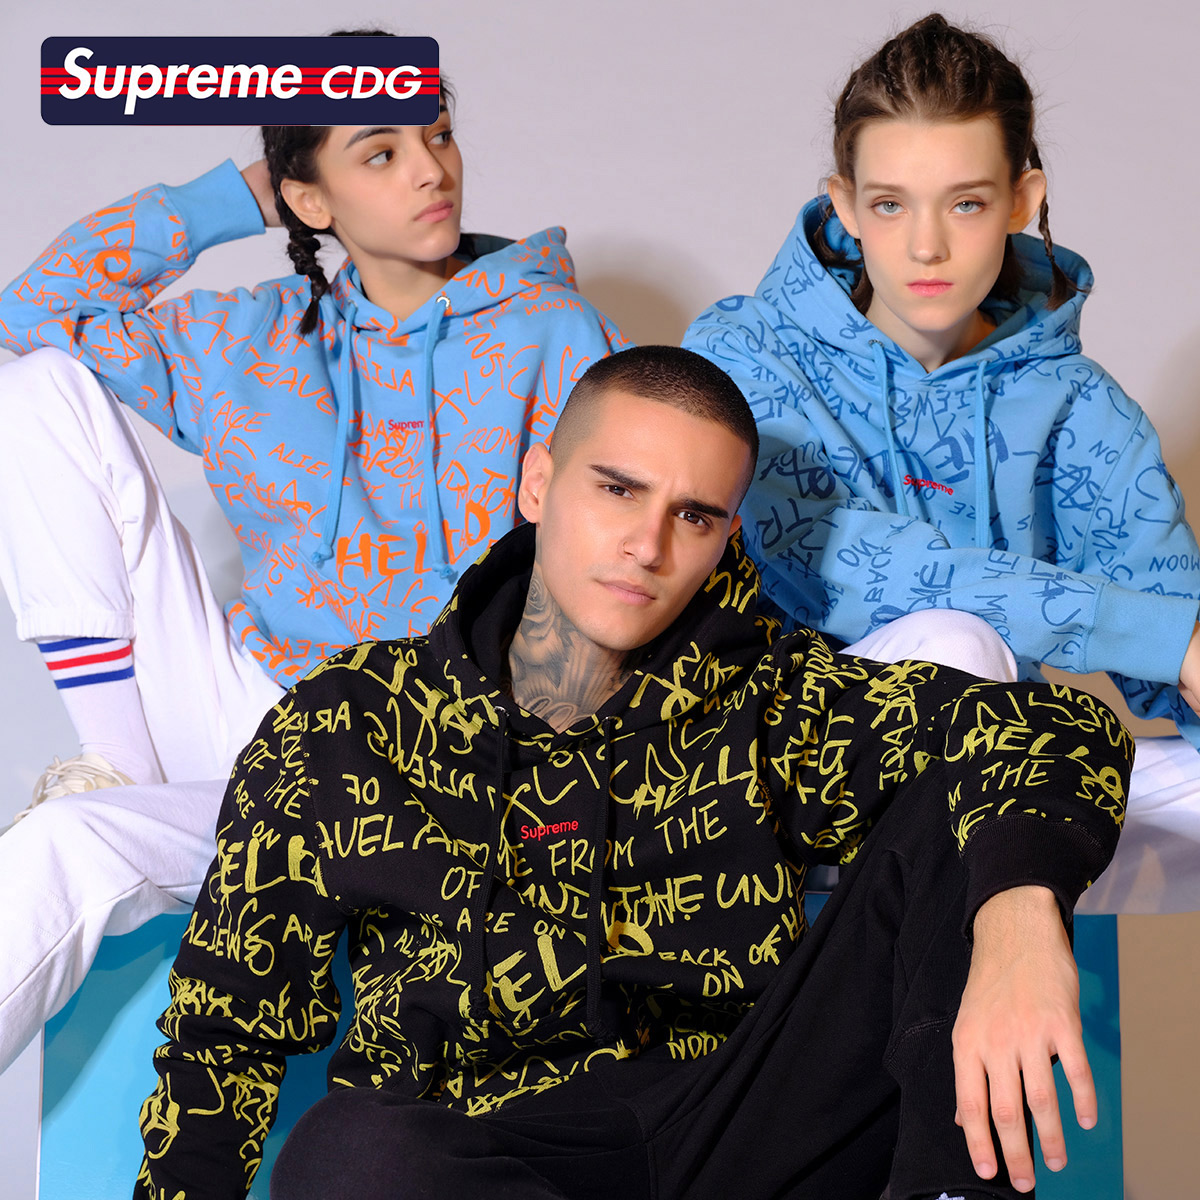 Supreme CDG 2020年春季新品个性字母印花时尚休闲连帽卫衣男女款